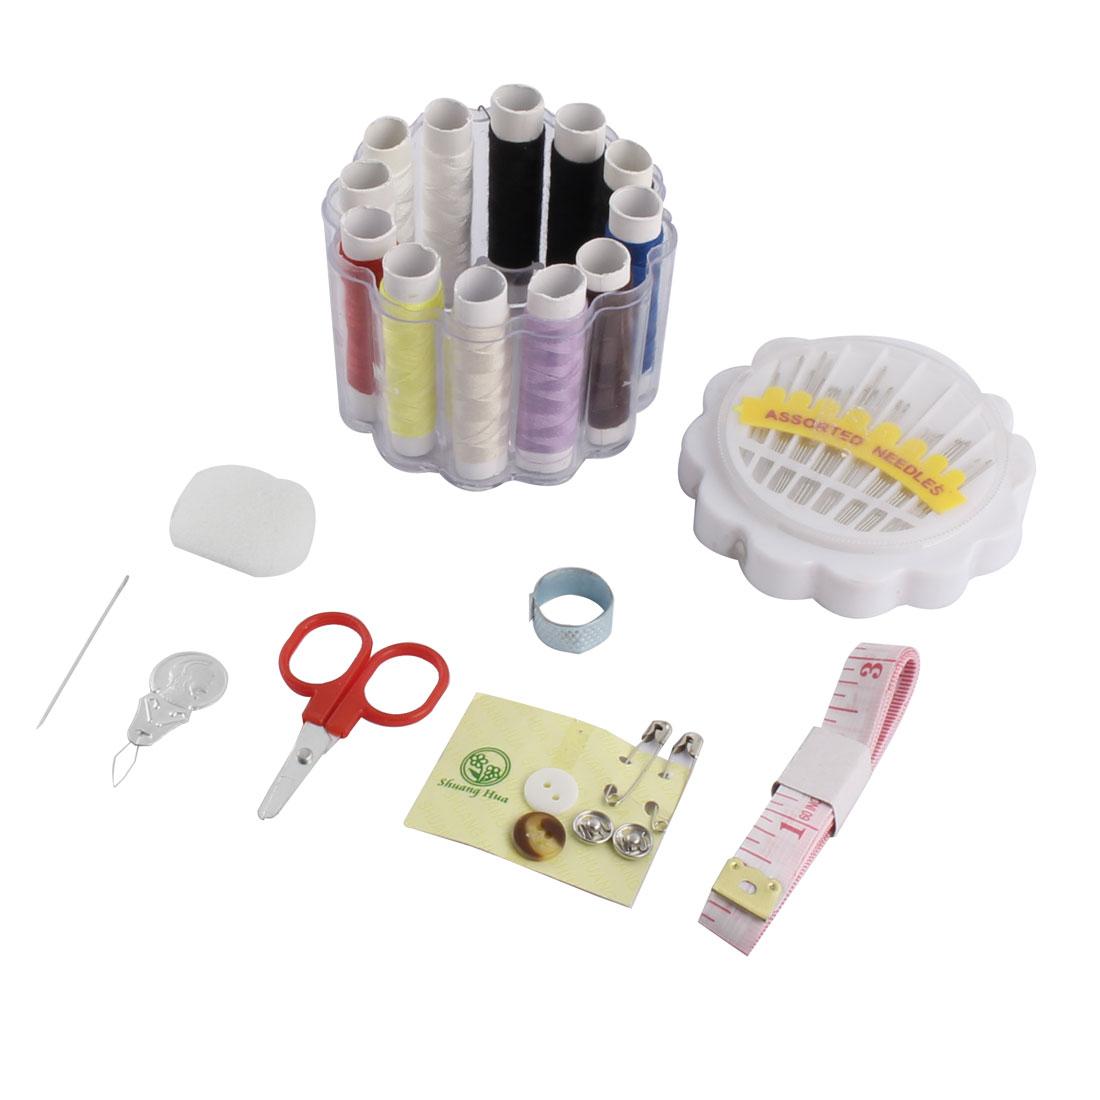 Plastic Box Measuring Tape Needle Thread Scissors Thimble Sewing Tool Kit White